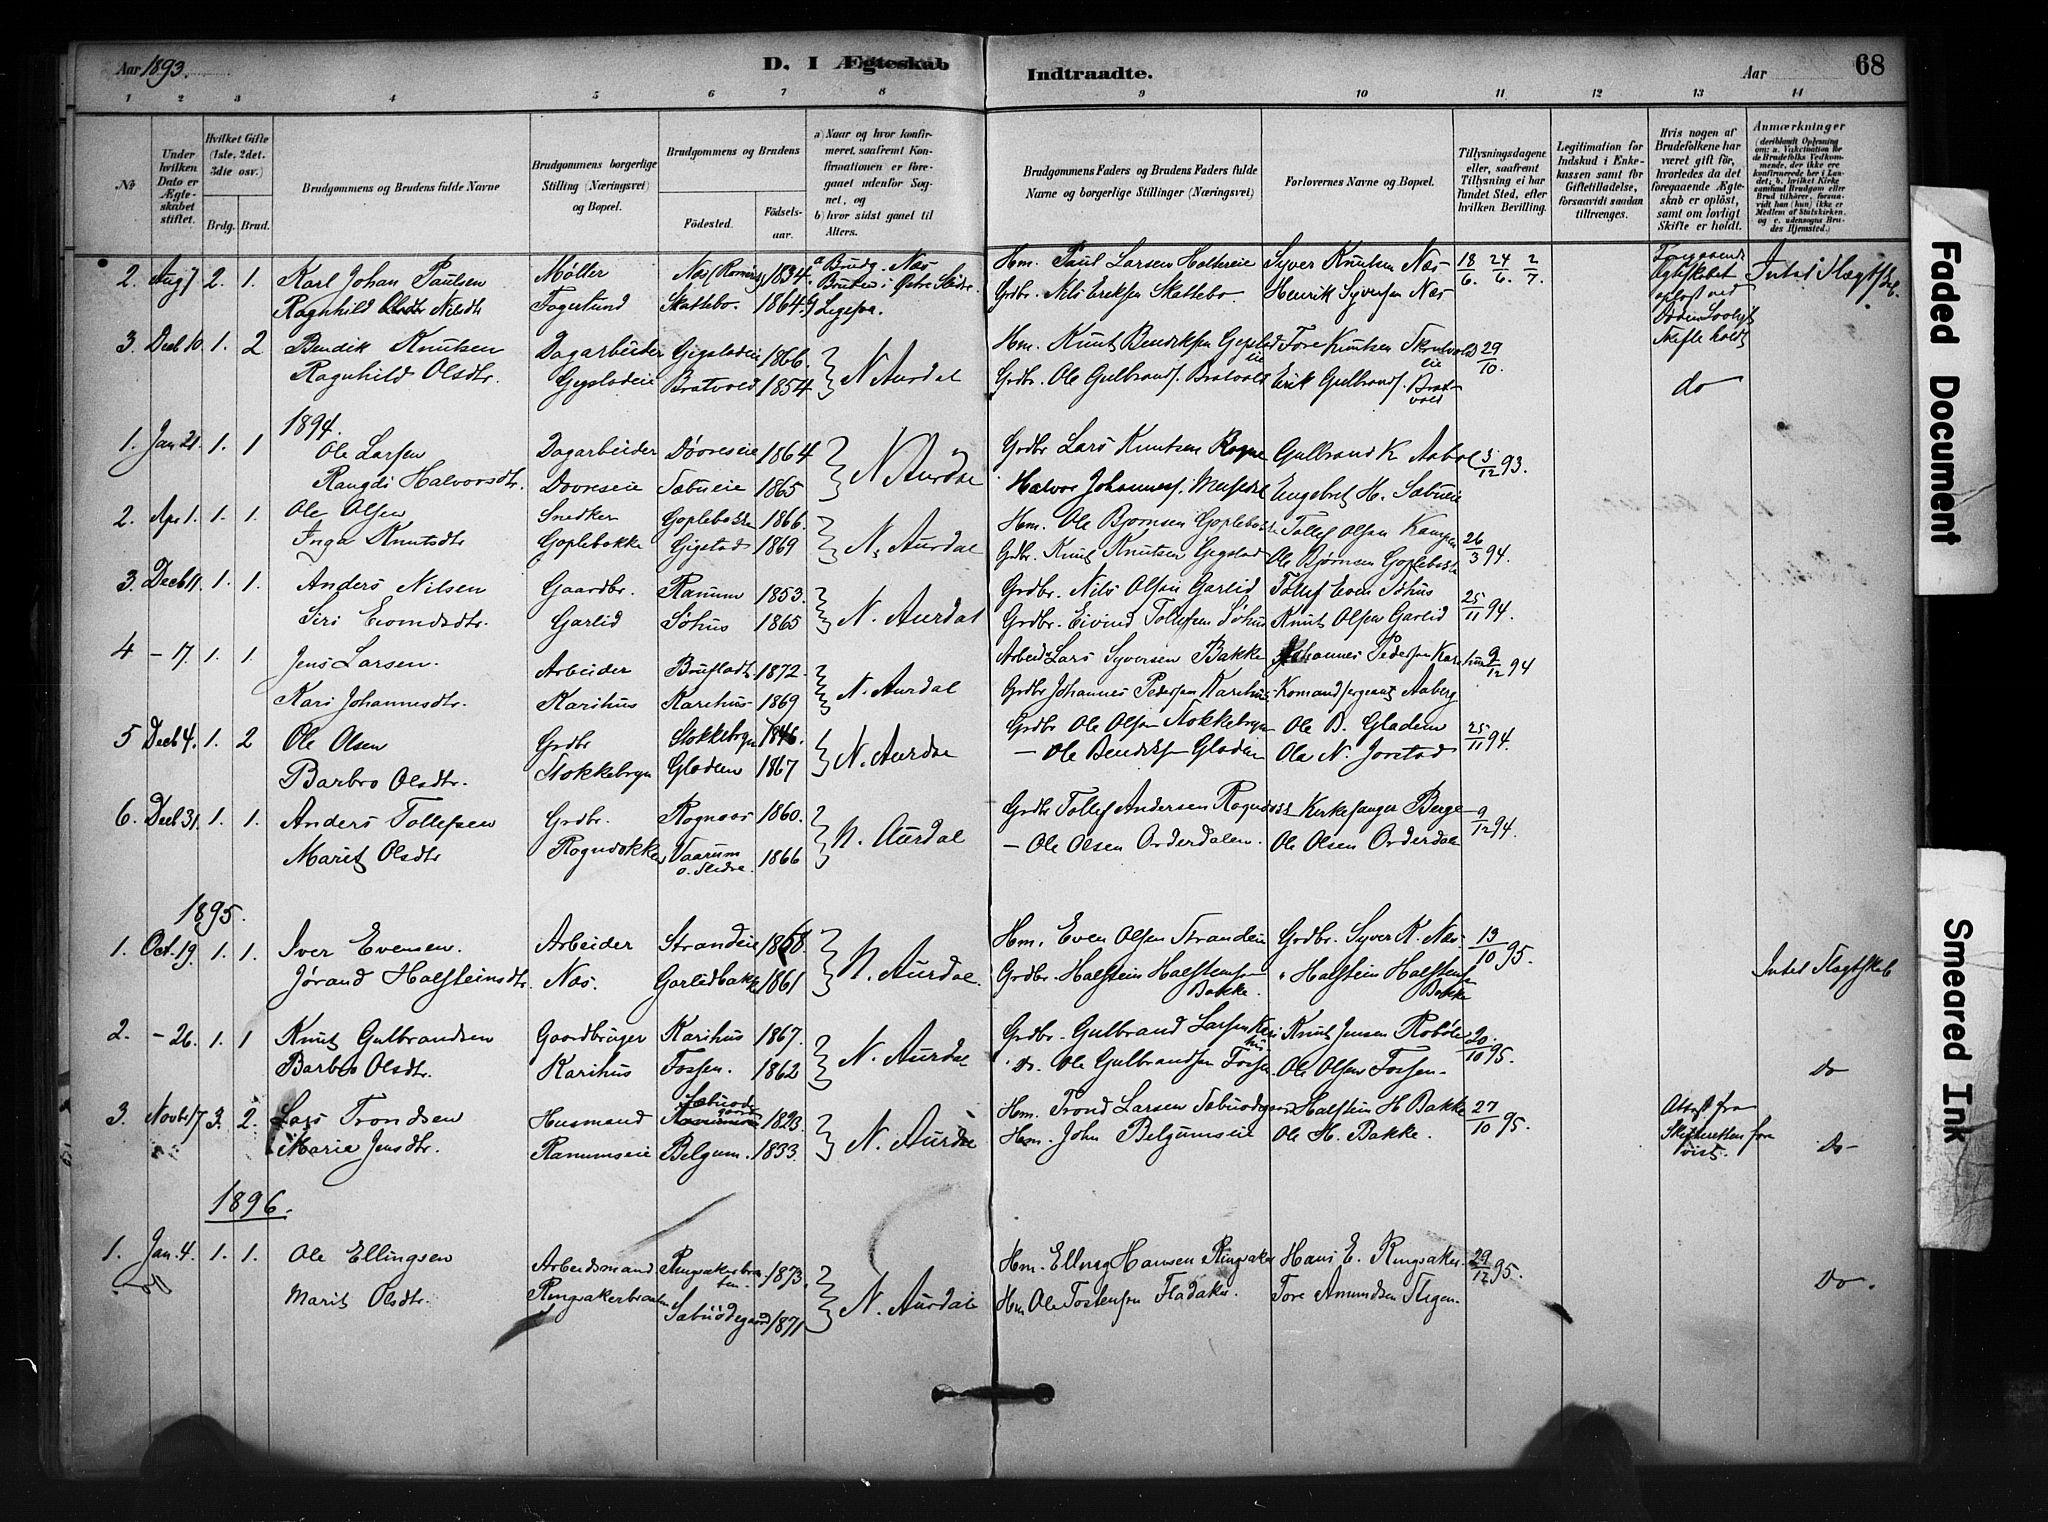 SAH, Nord-Aurdal prestekontor, Ministerialbok nr. 12, 1883-1895, s. 68